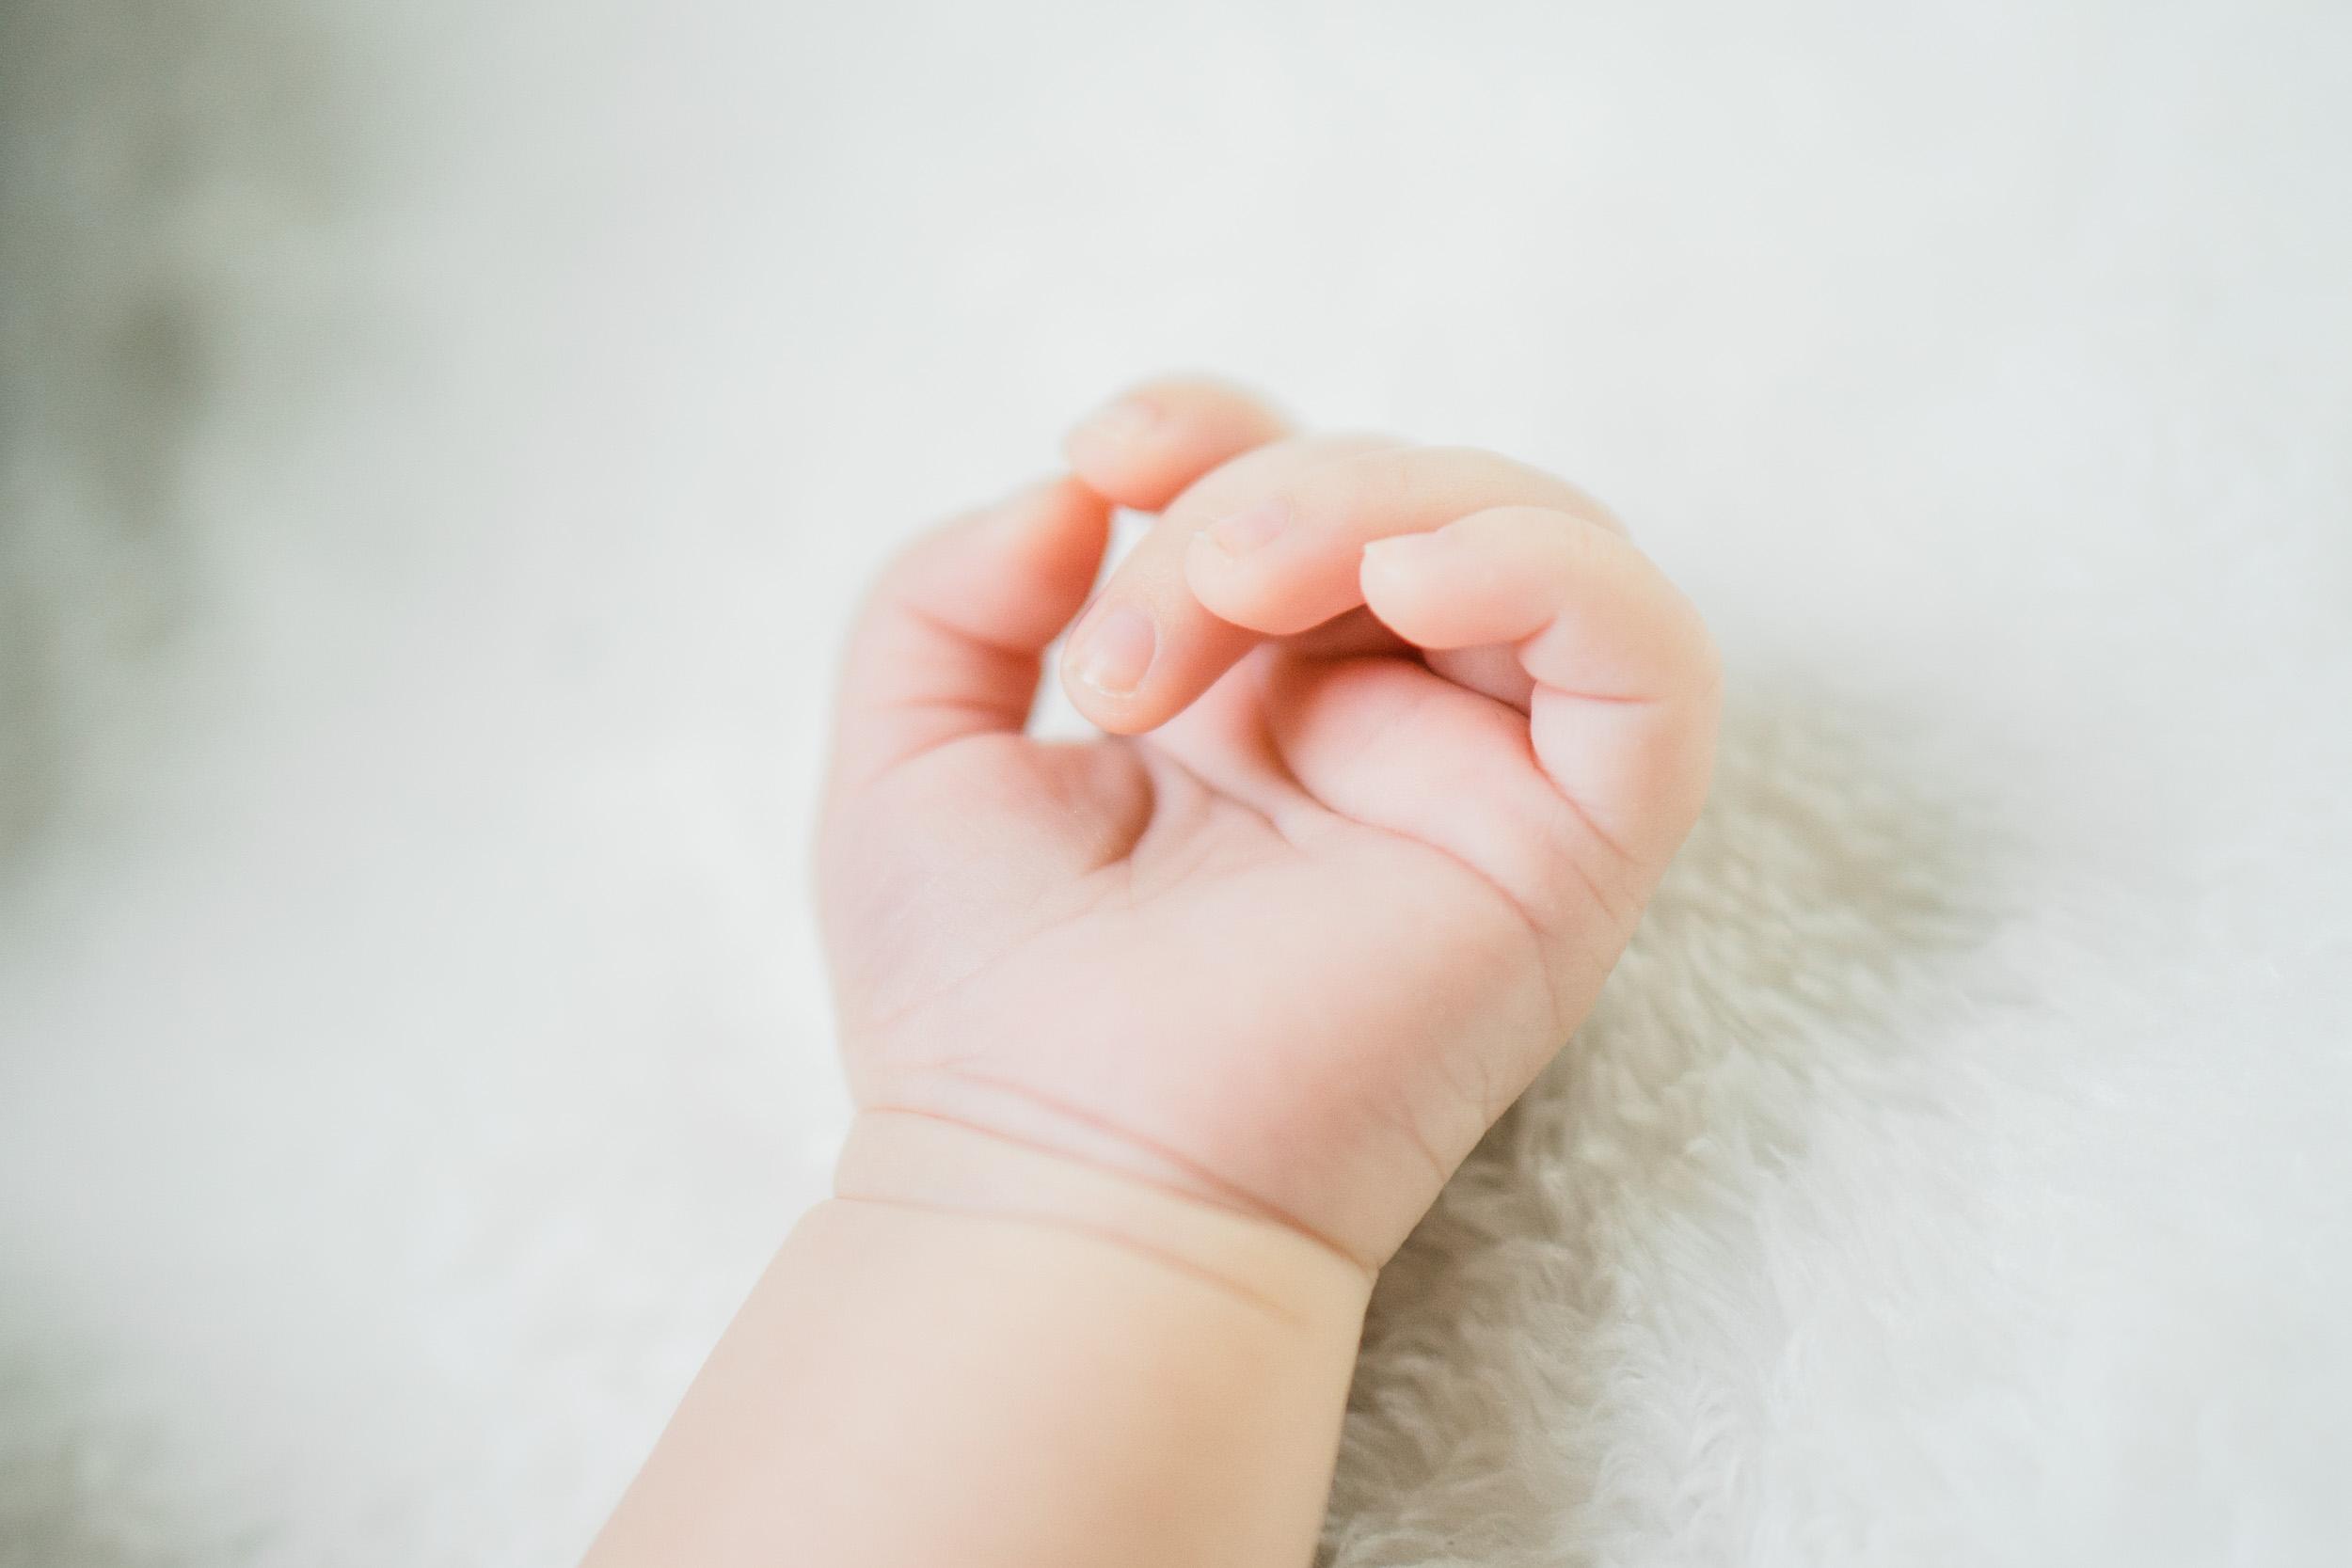 little baby hand